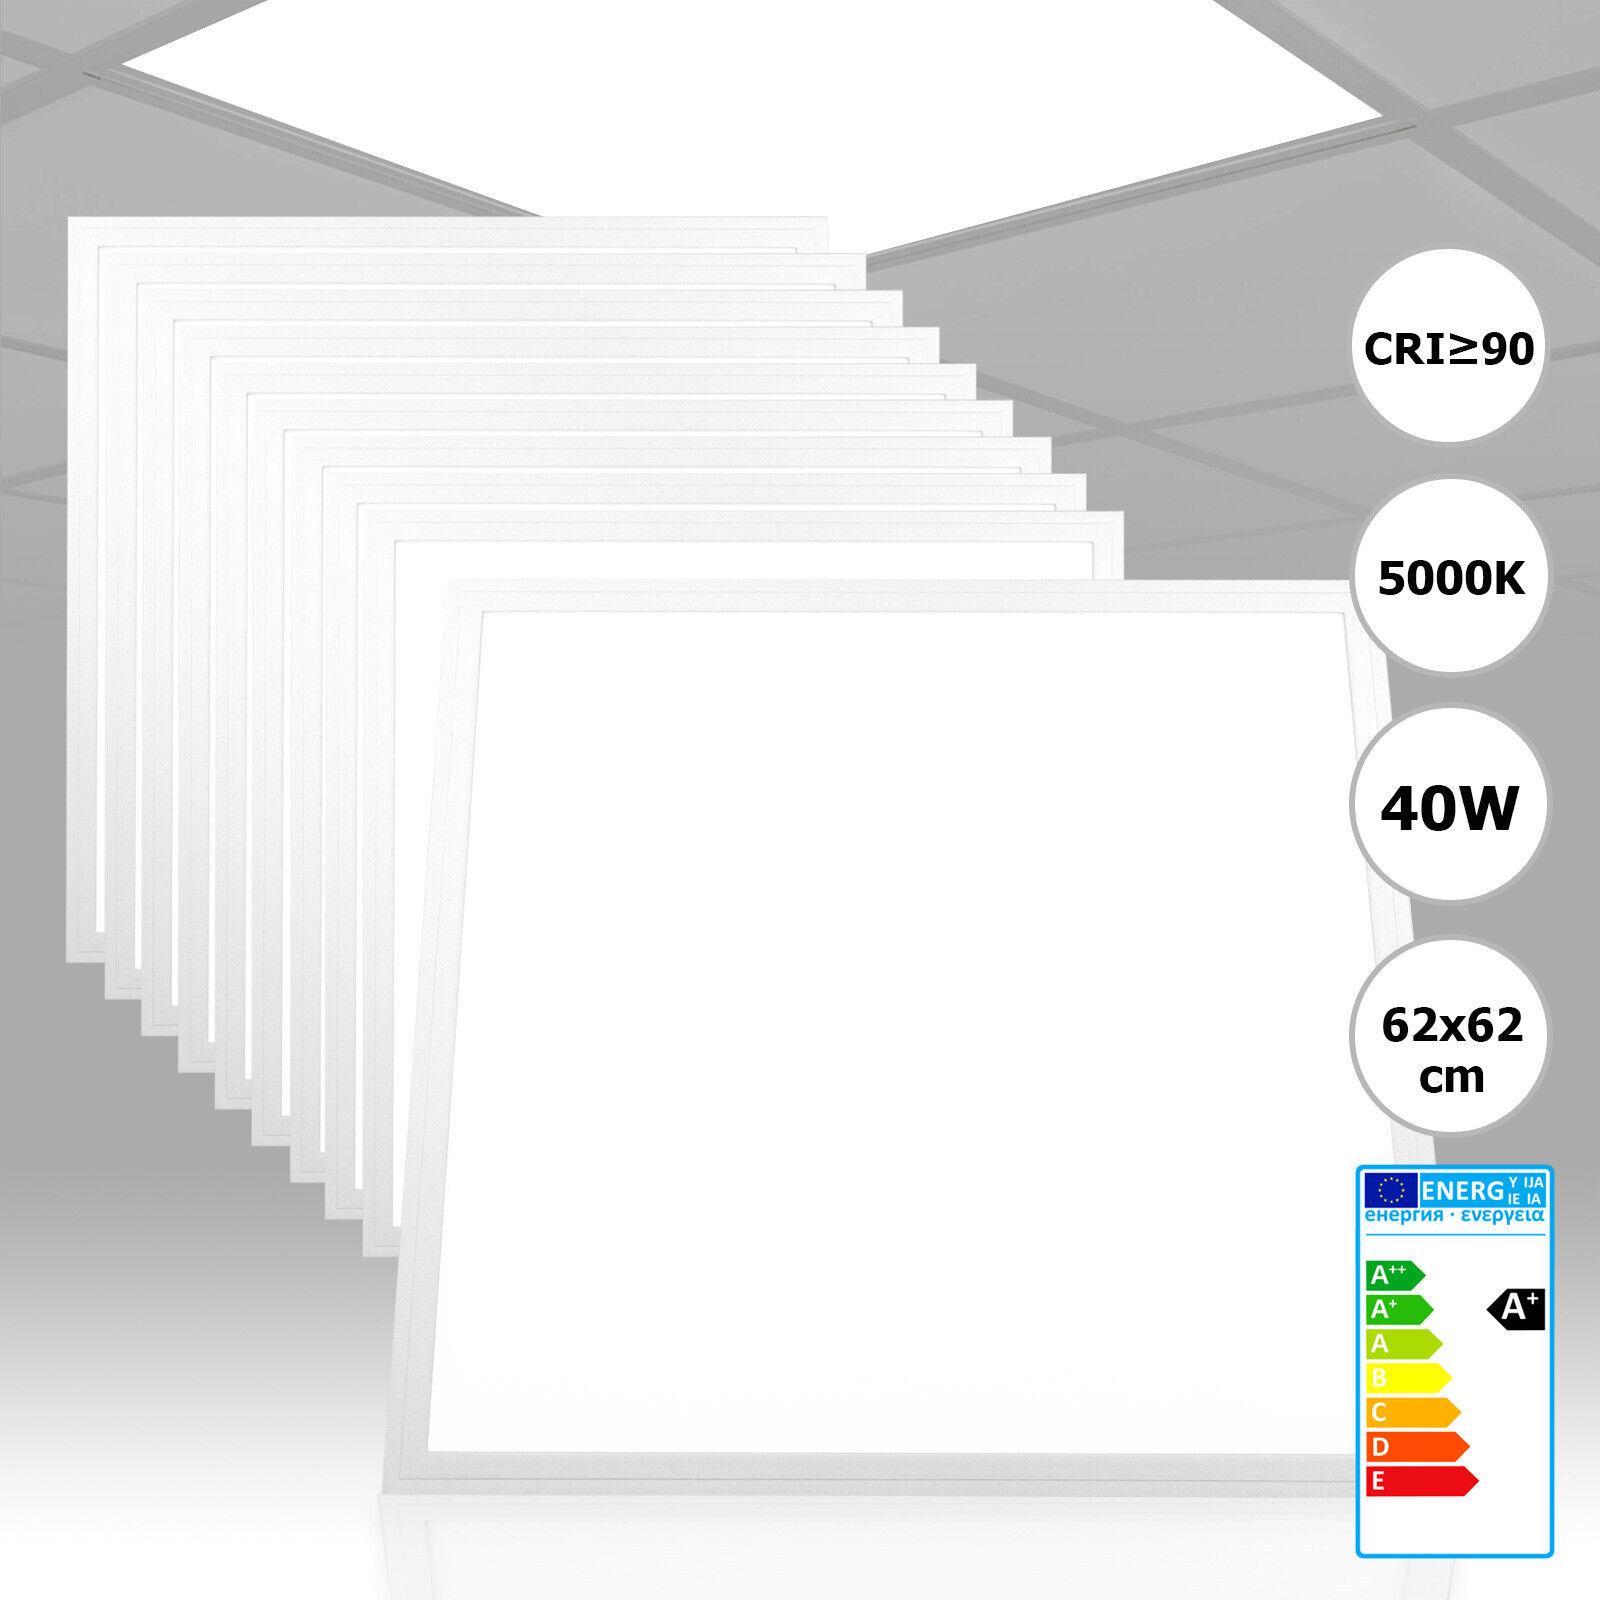 10x Xtend LED Panel 62x62 Neutralweiß 40W 5000K CRI90 hohe Farbwiedergabe PMMA